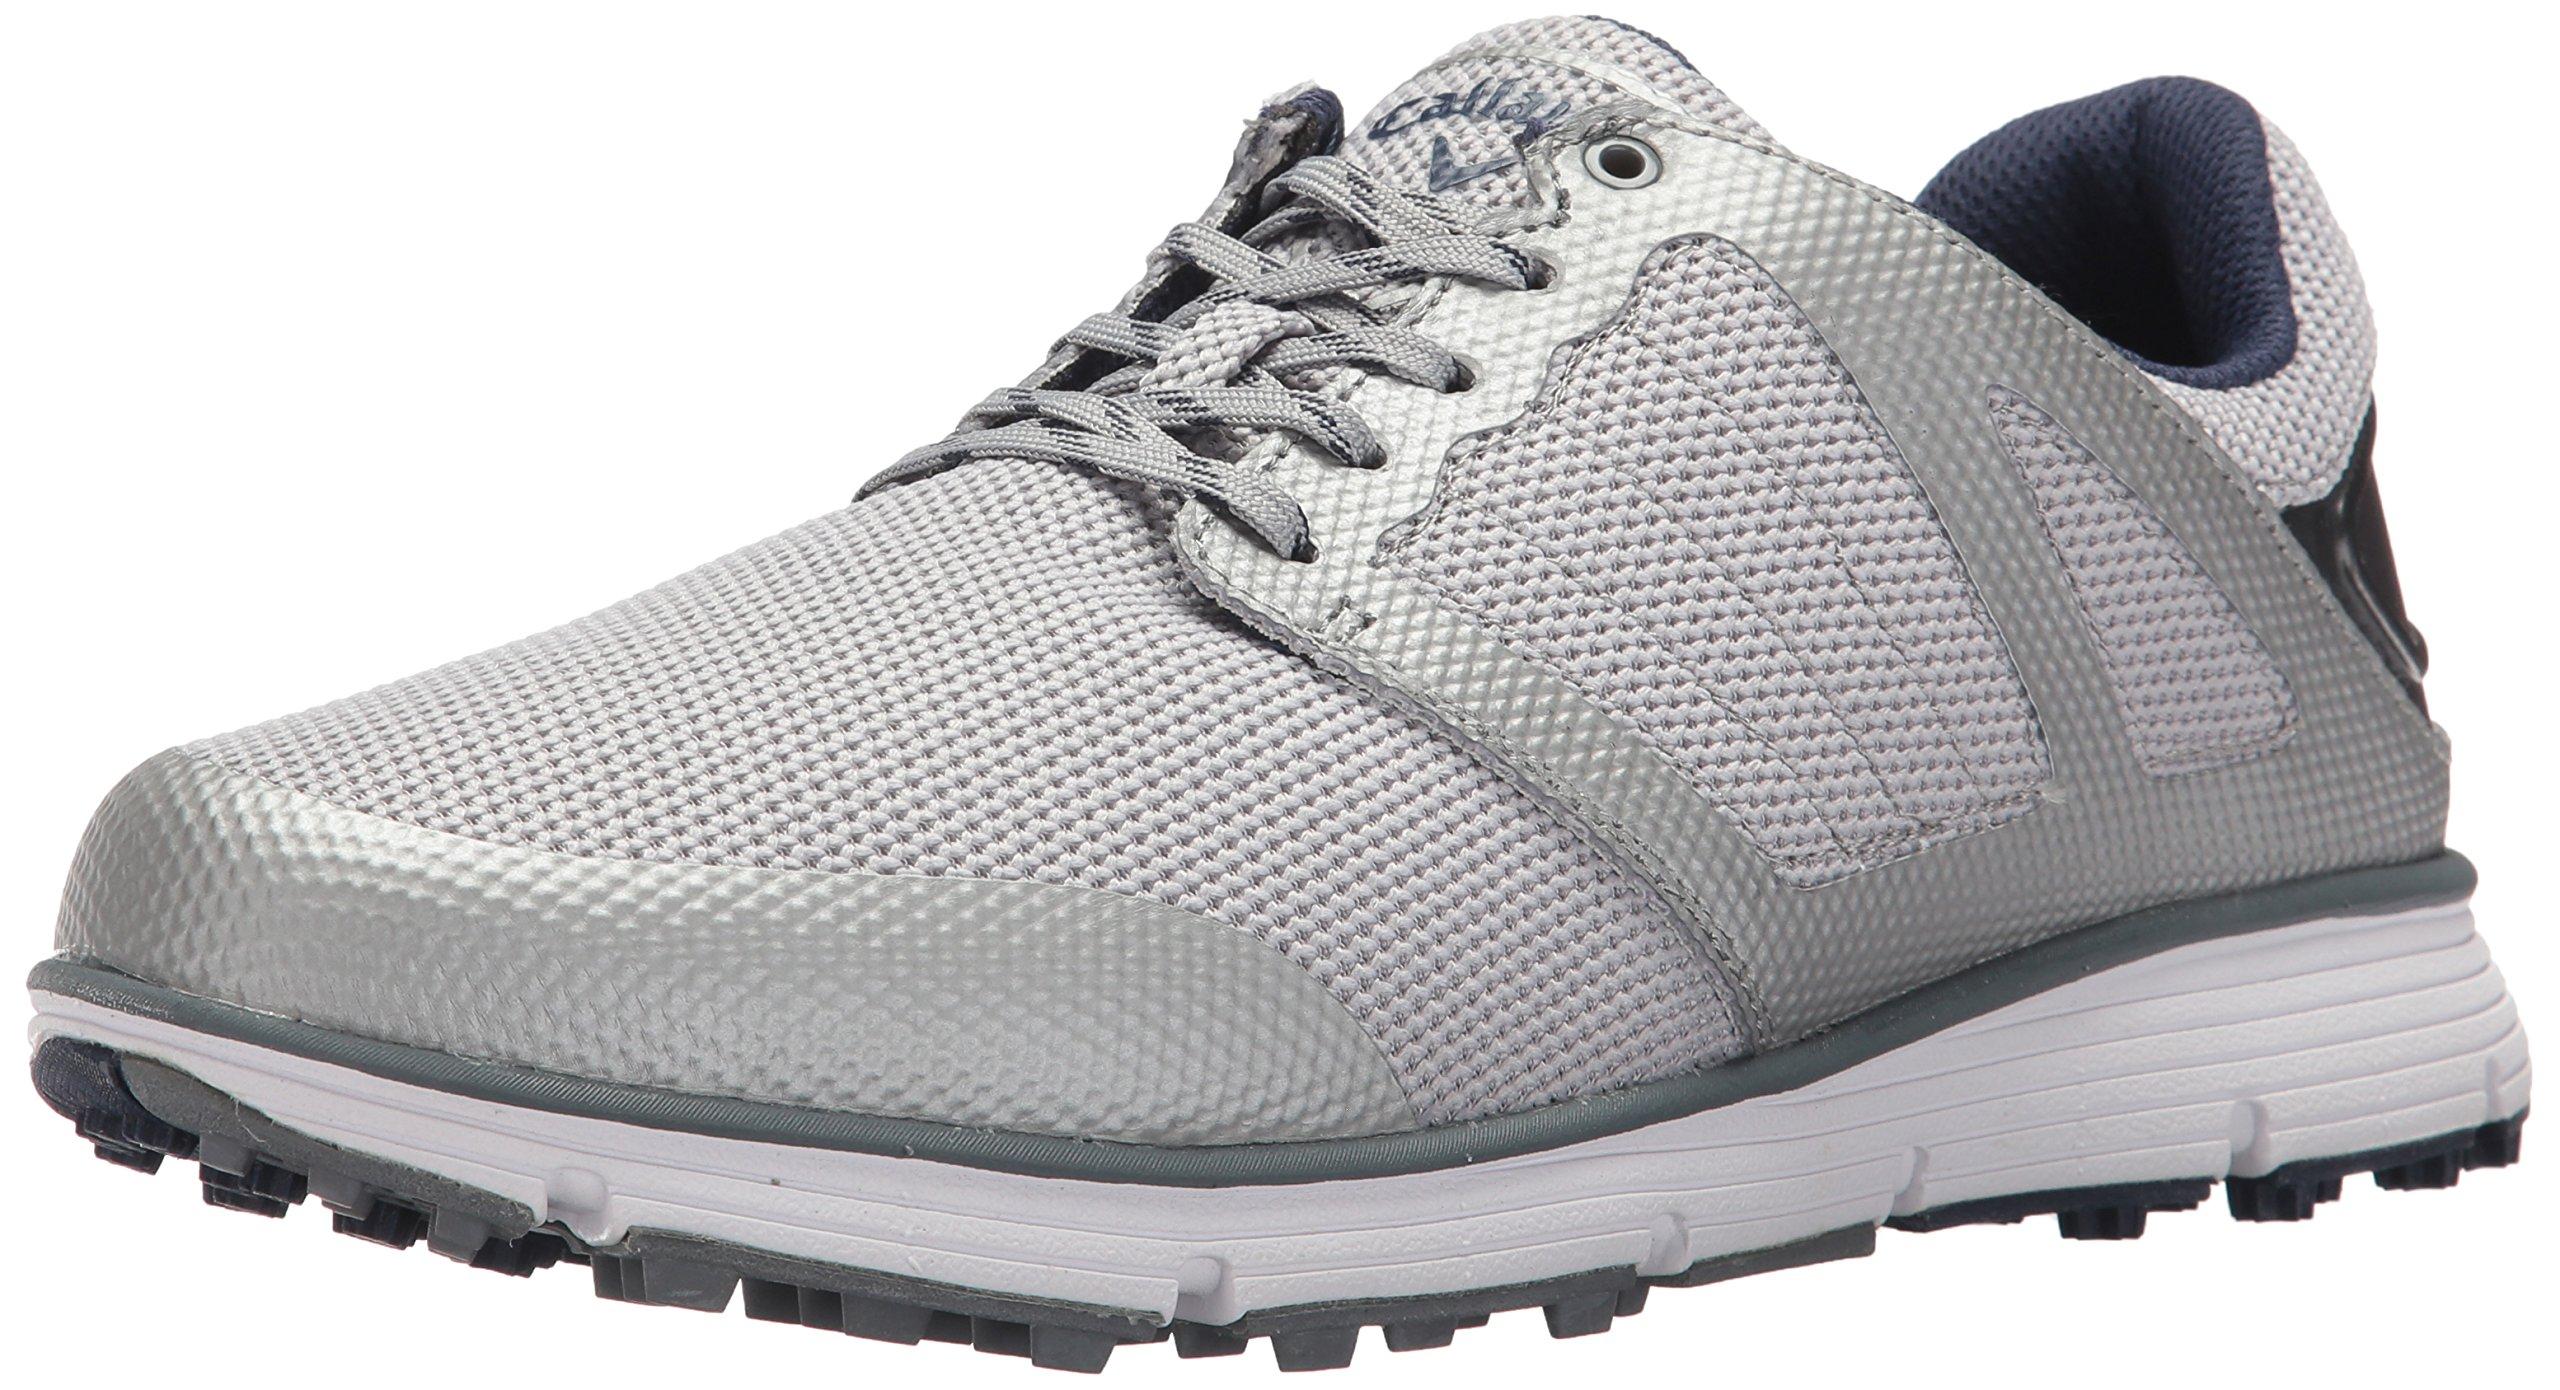 Callaway Men's Balboa Vent 2.0 Golf Shoe, Grey, 10.5 2E 2E US